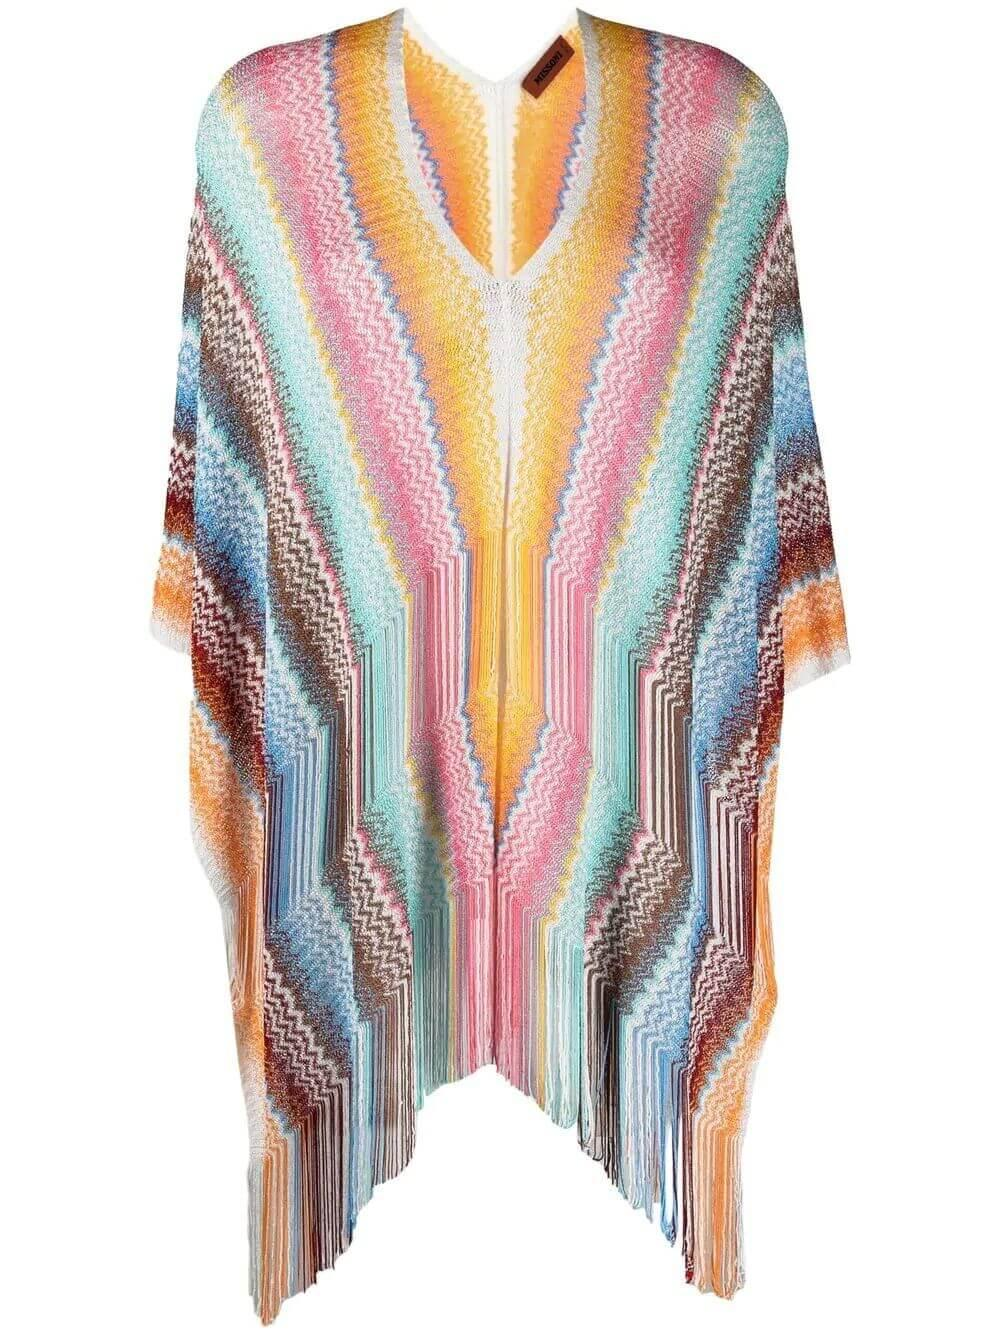 Striped Poncho With Fringe Trim Item # QPT8VMD7871